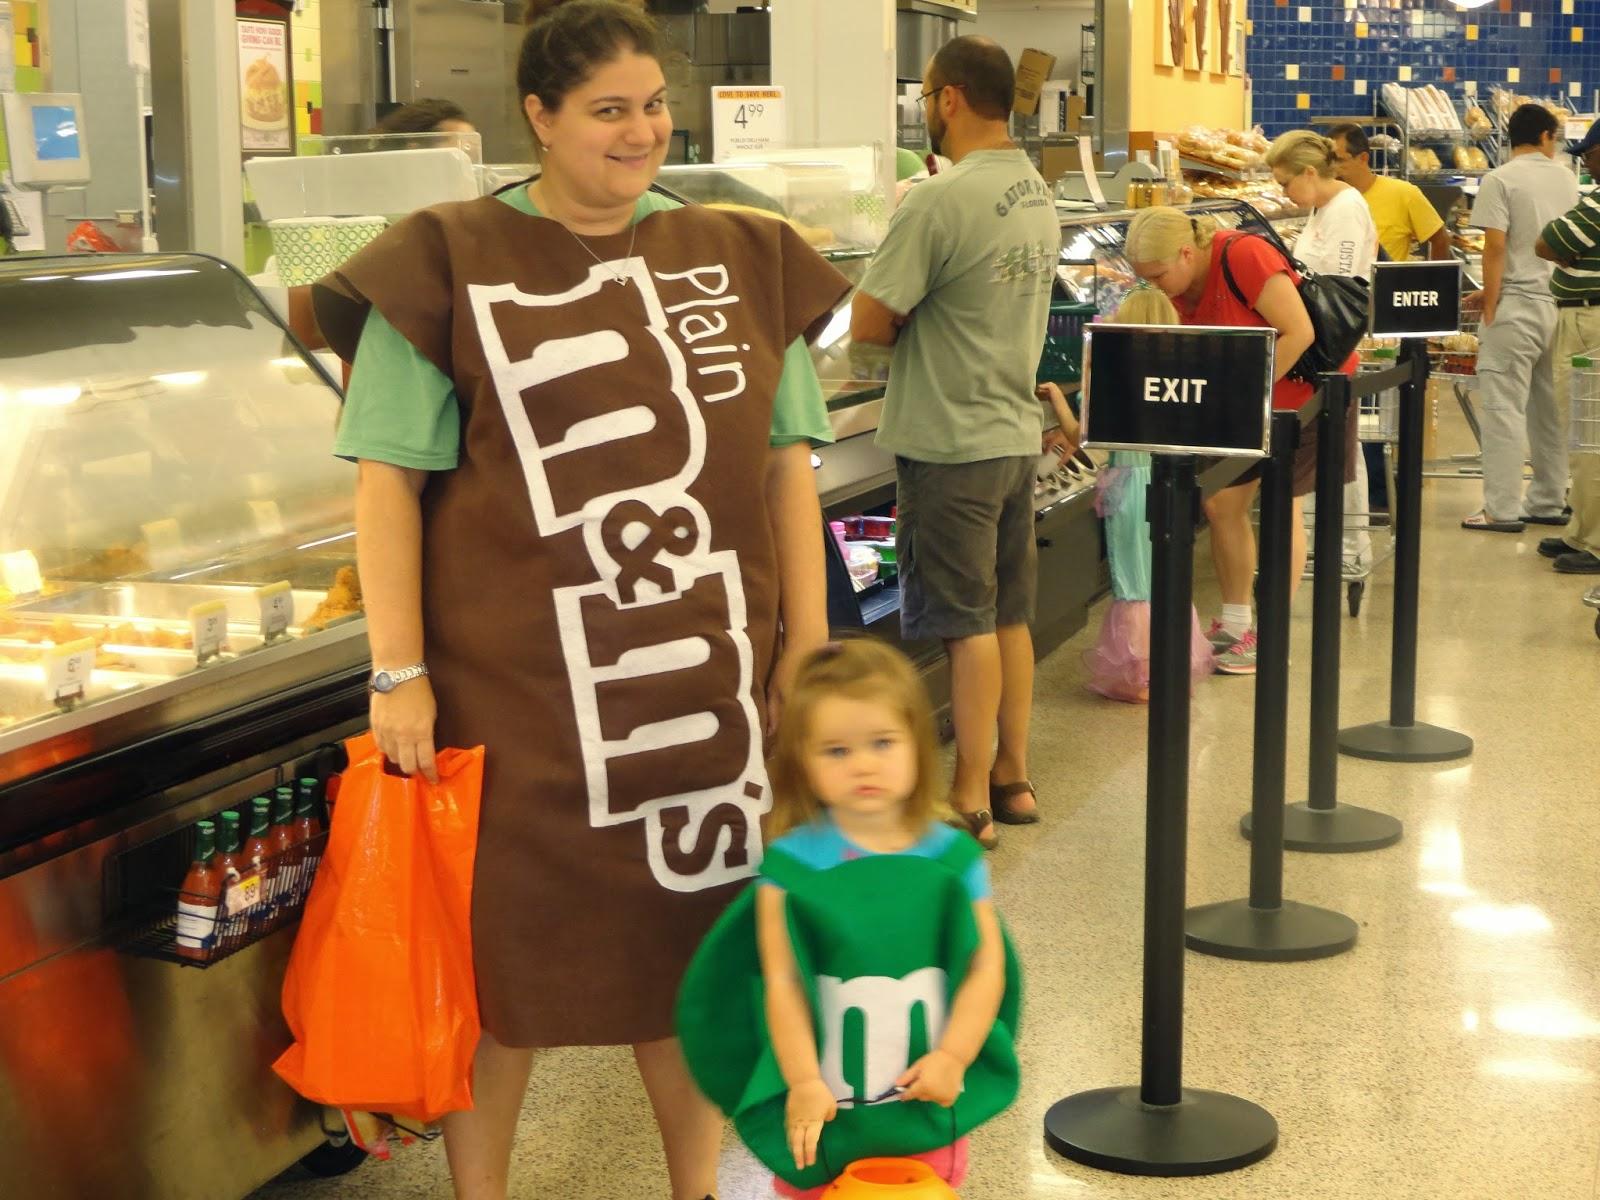 and the dadda was a bag of peanut mms